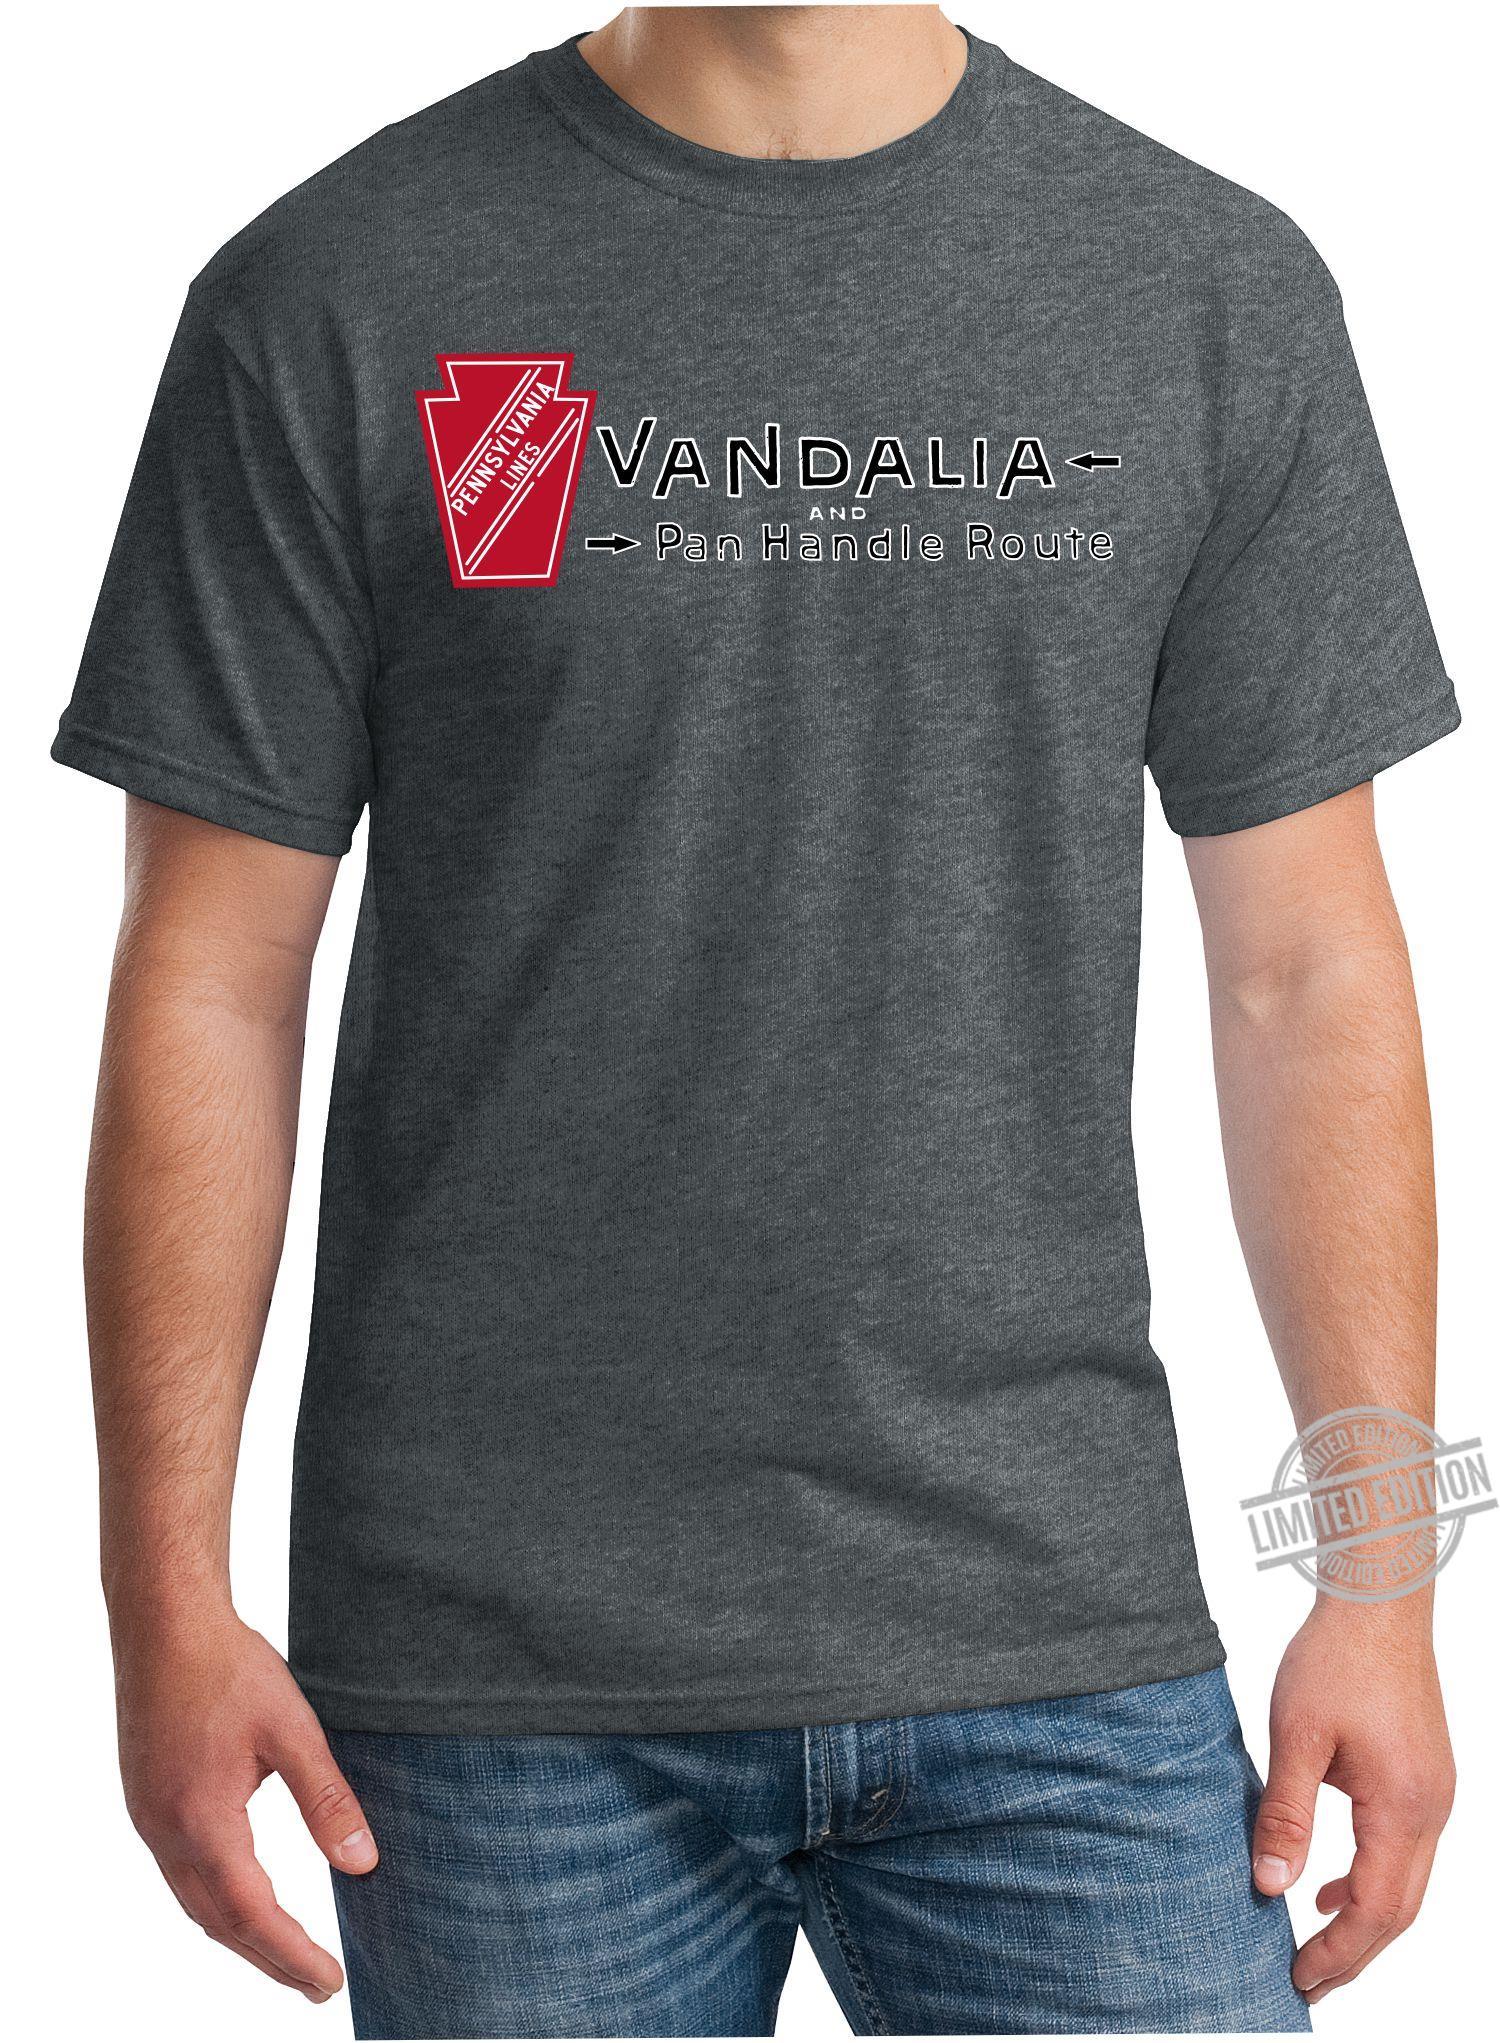 Pennsylvania Lines Vandalia And Pan Handle Route Shirt